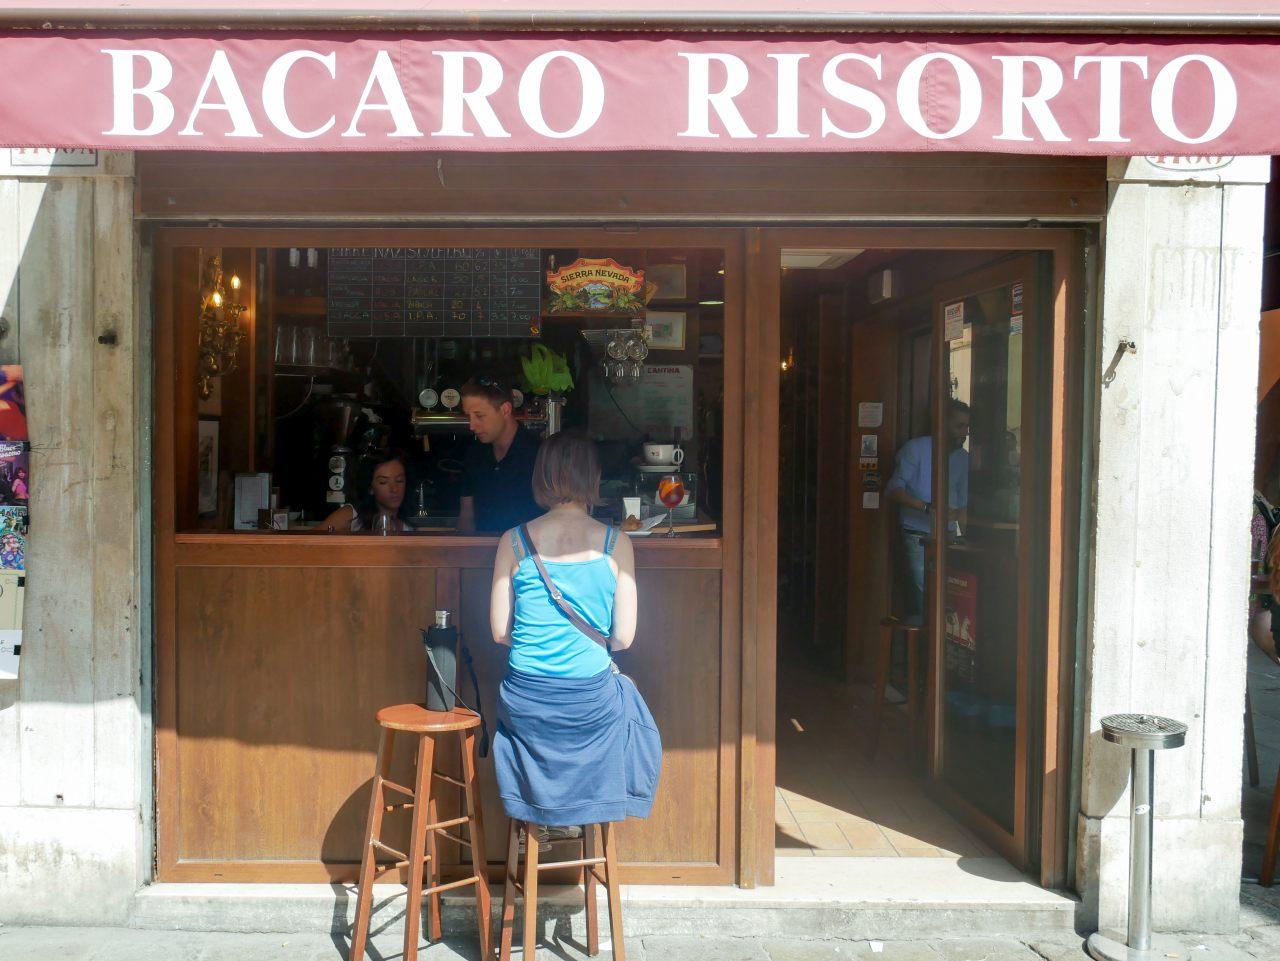 meilleurs cicchetti de Venise: Bacaro Risorto